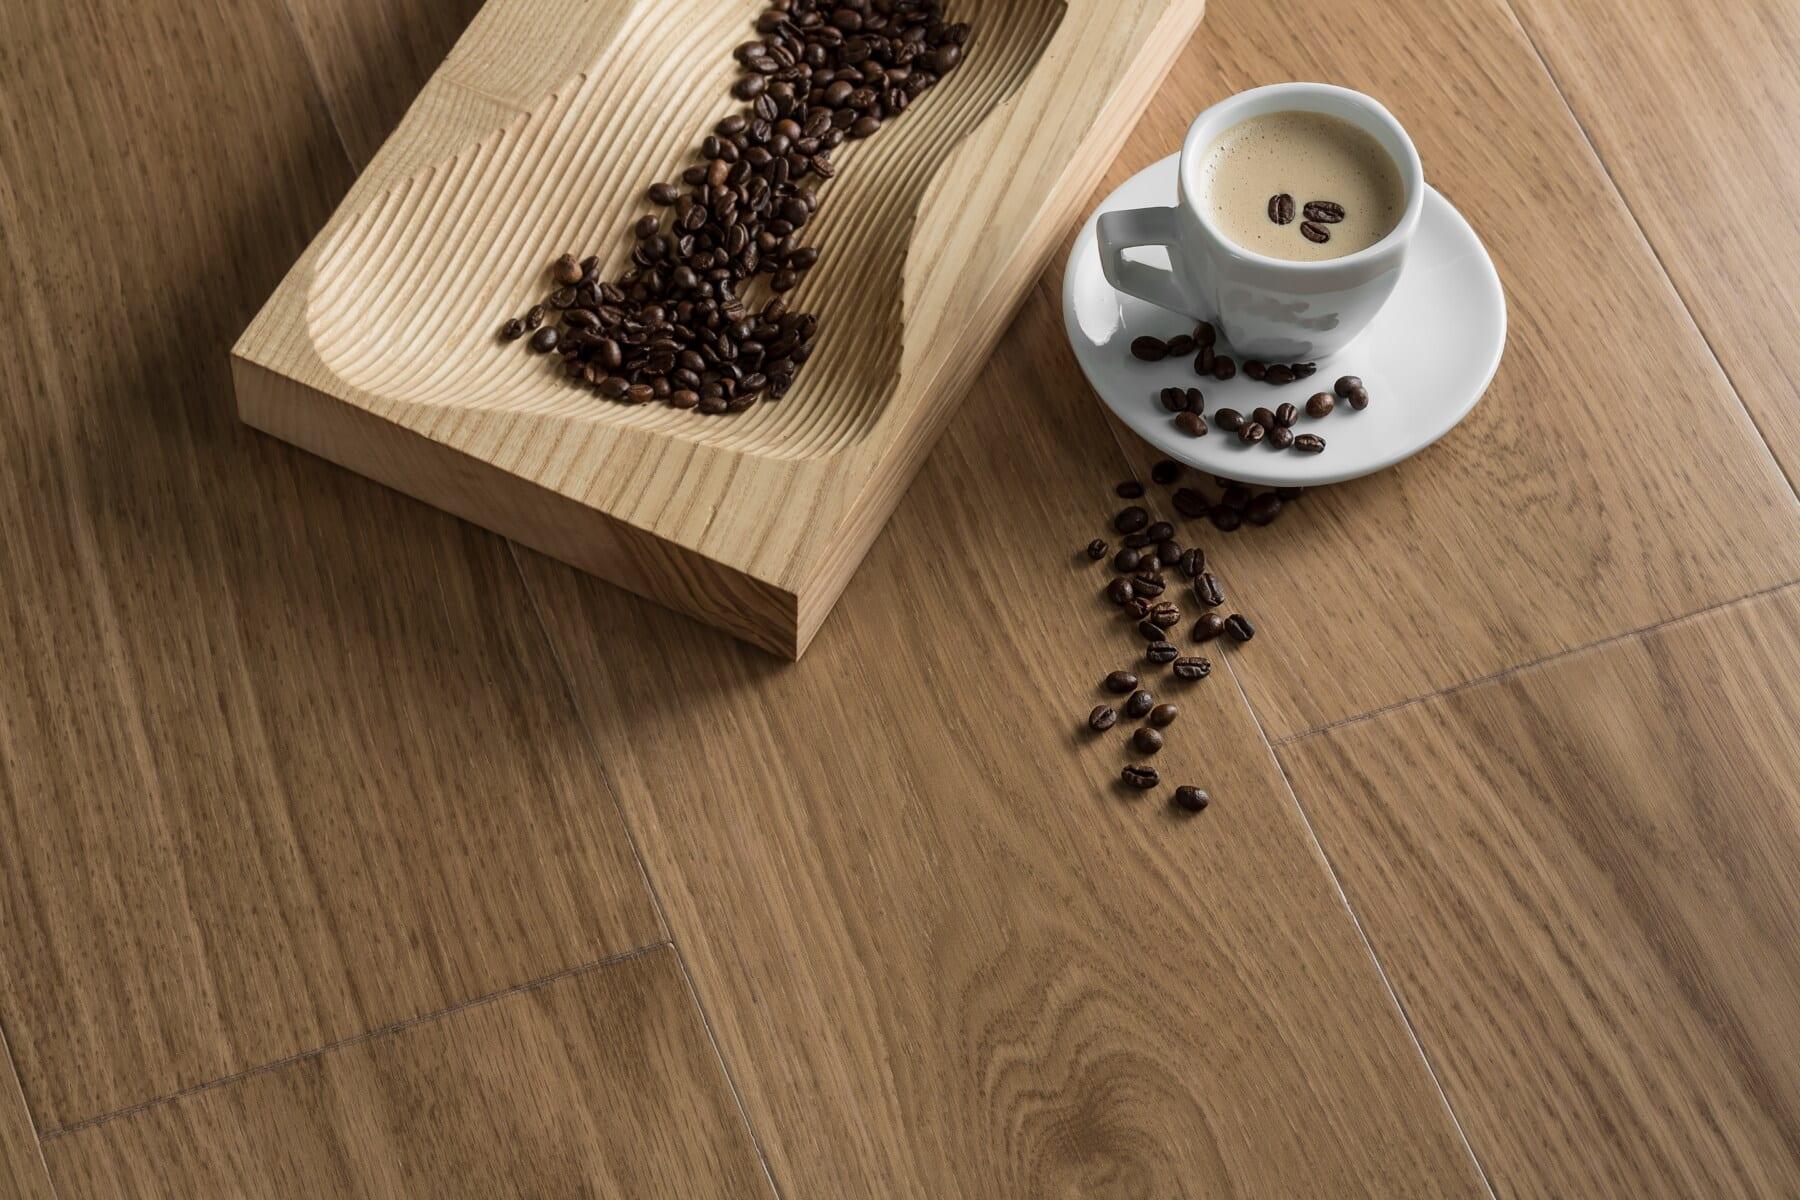 Koffein, Cappuccino, Dunkel, Kaffeetasse, Braten, Kaffee, Espresso, Holz, Trinken, heiß